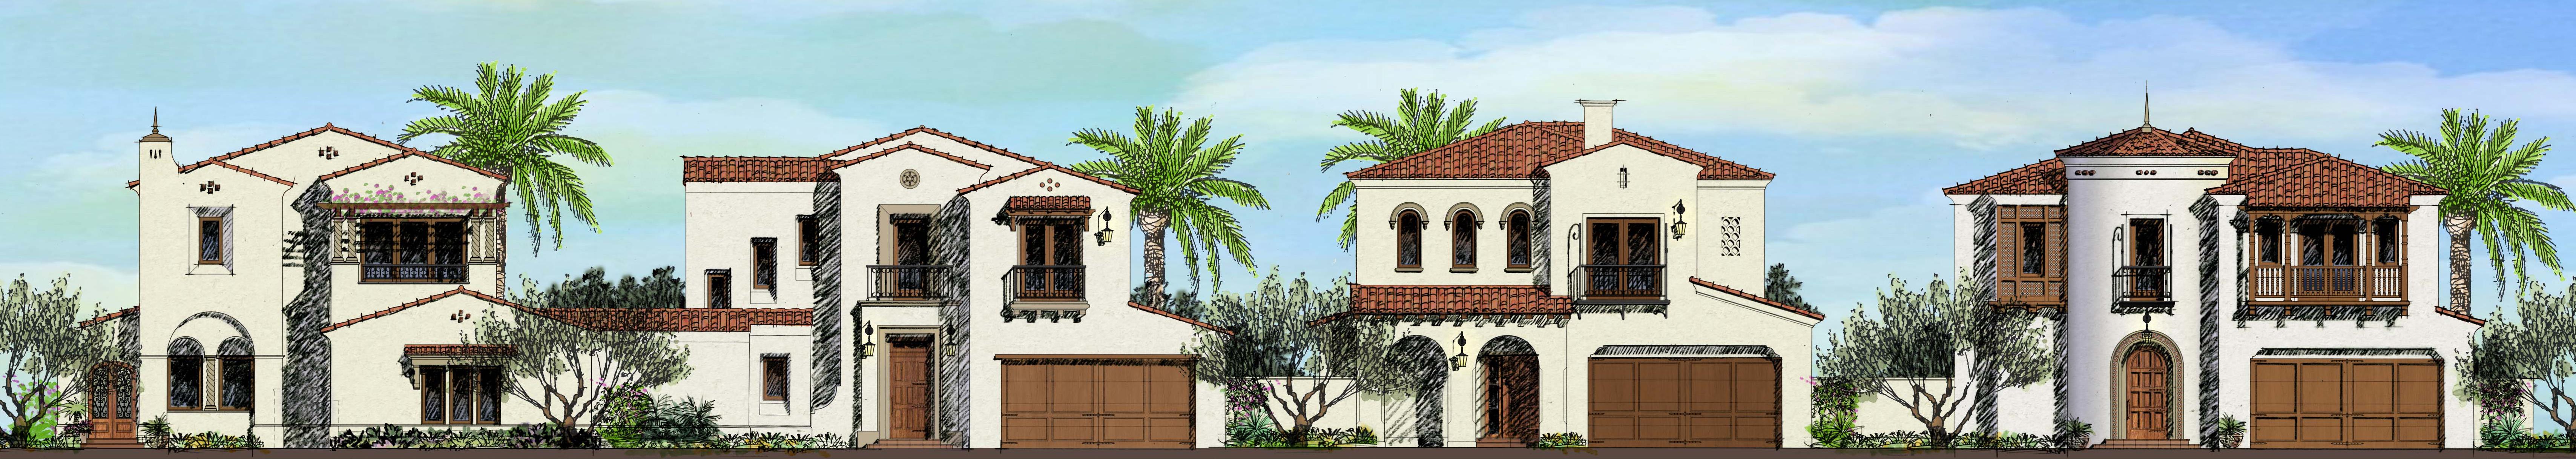 Rancho San Lucas Streetscene_small2